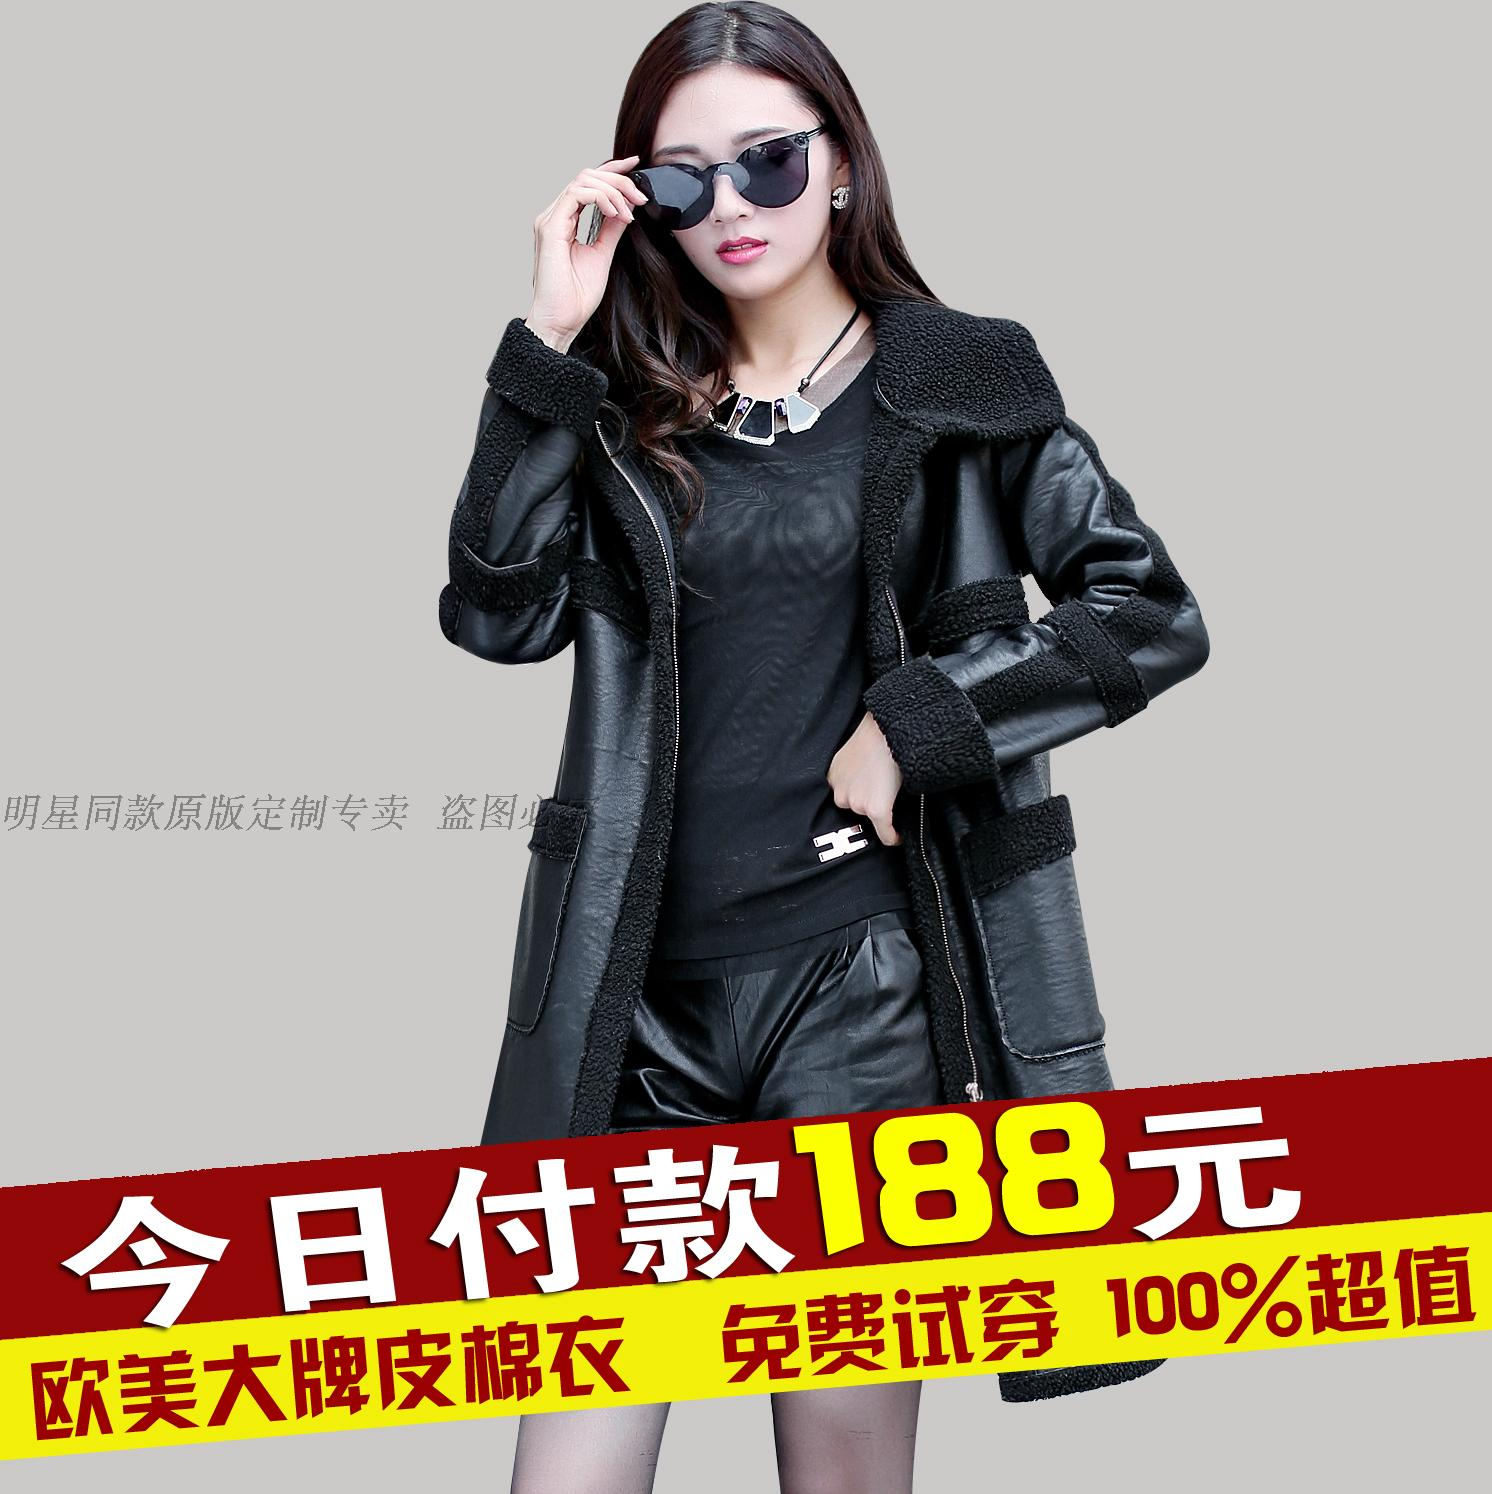 Кожаная куртка With original Star custom 8811 2014 PU кожаная куртка pu 2014